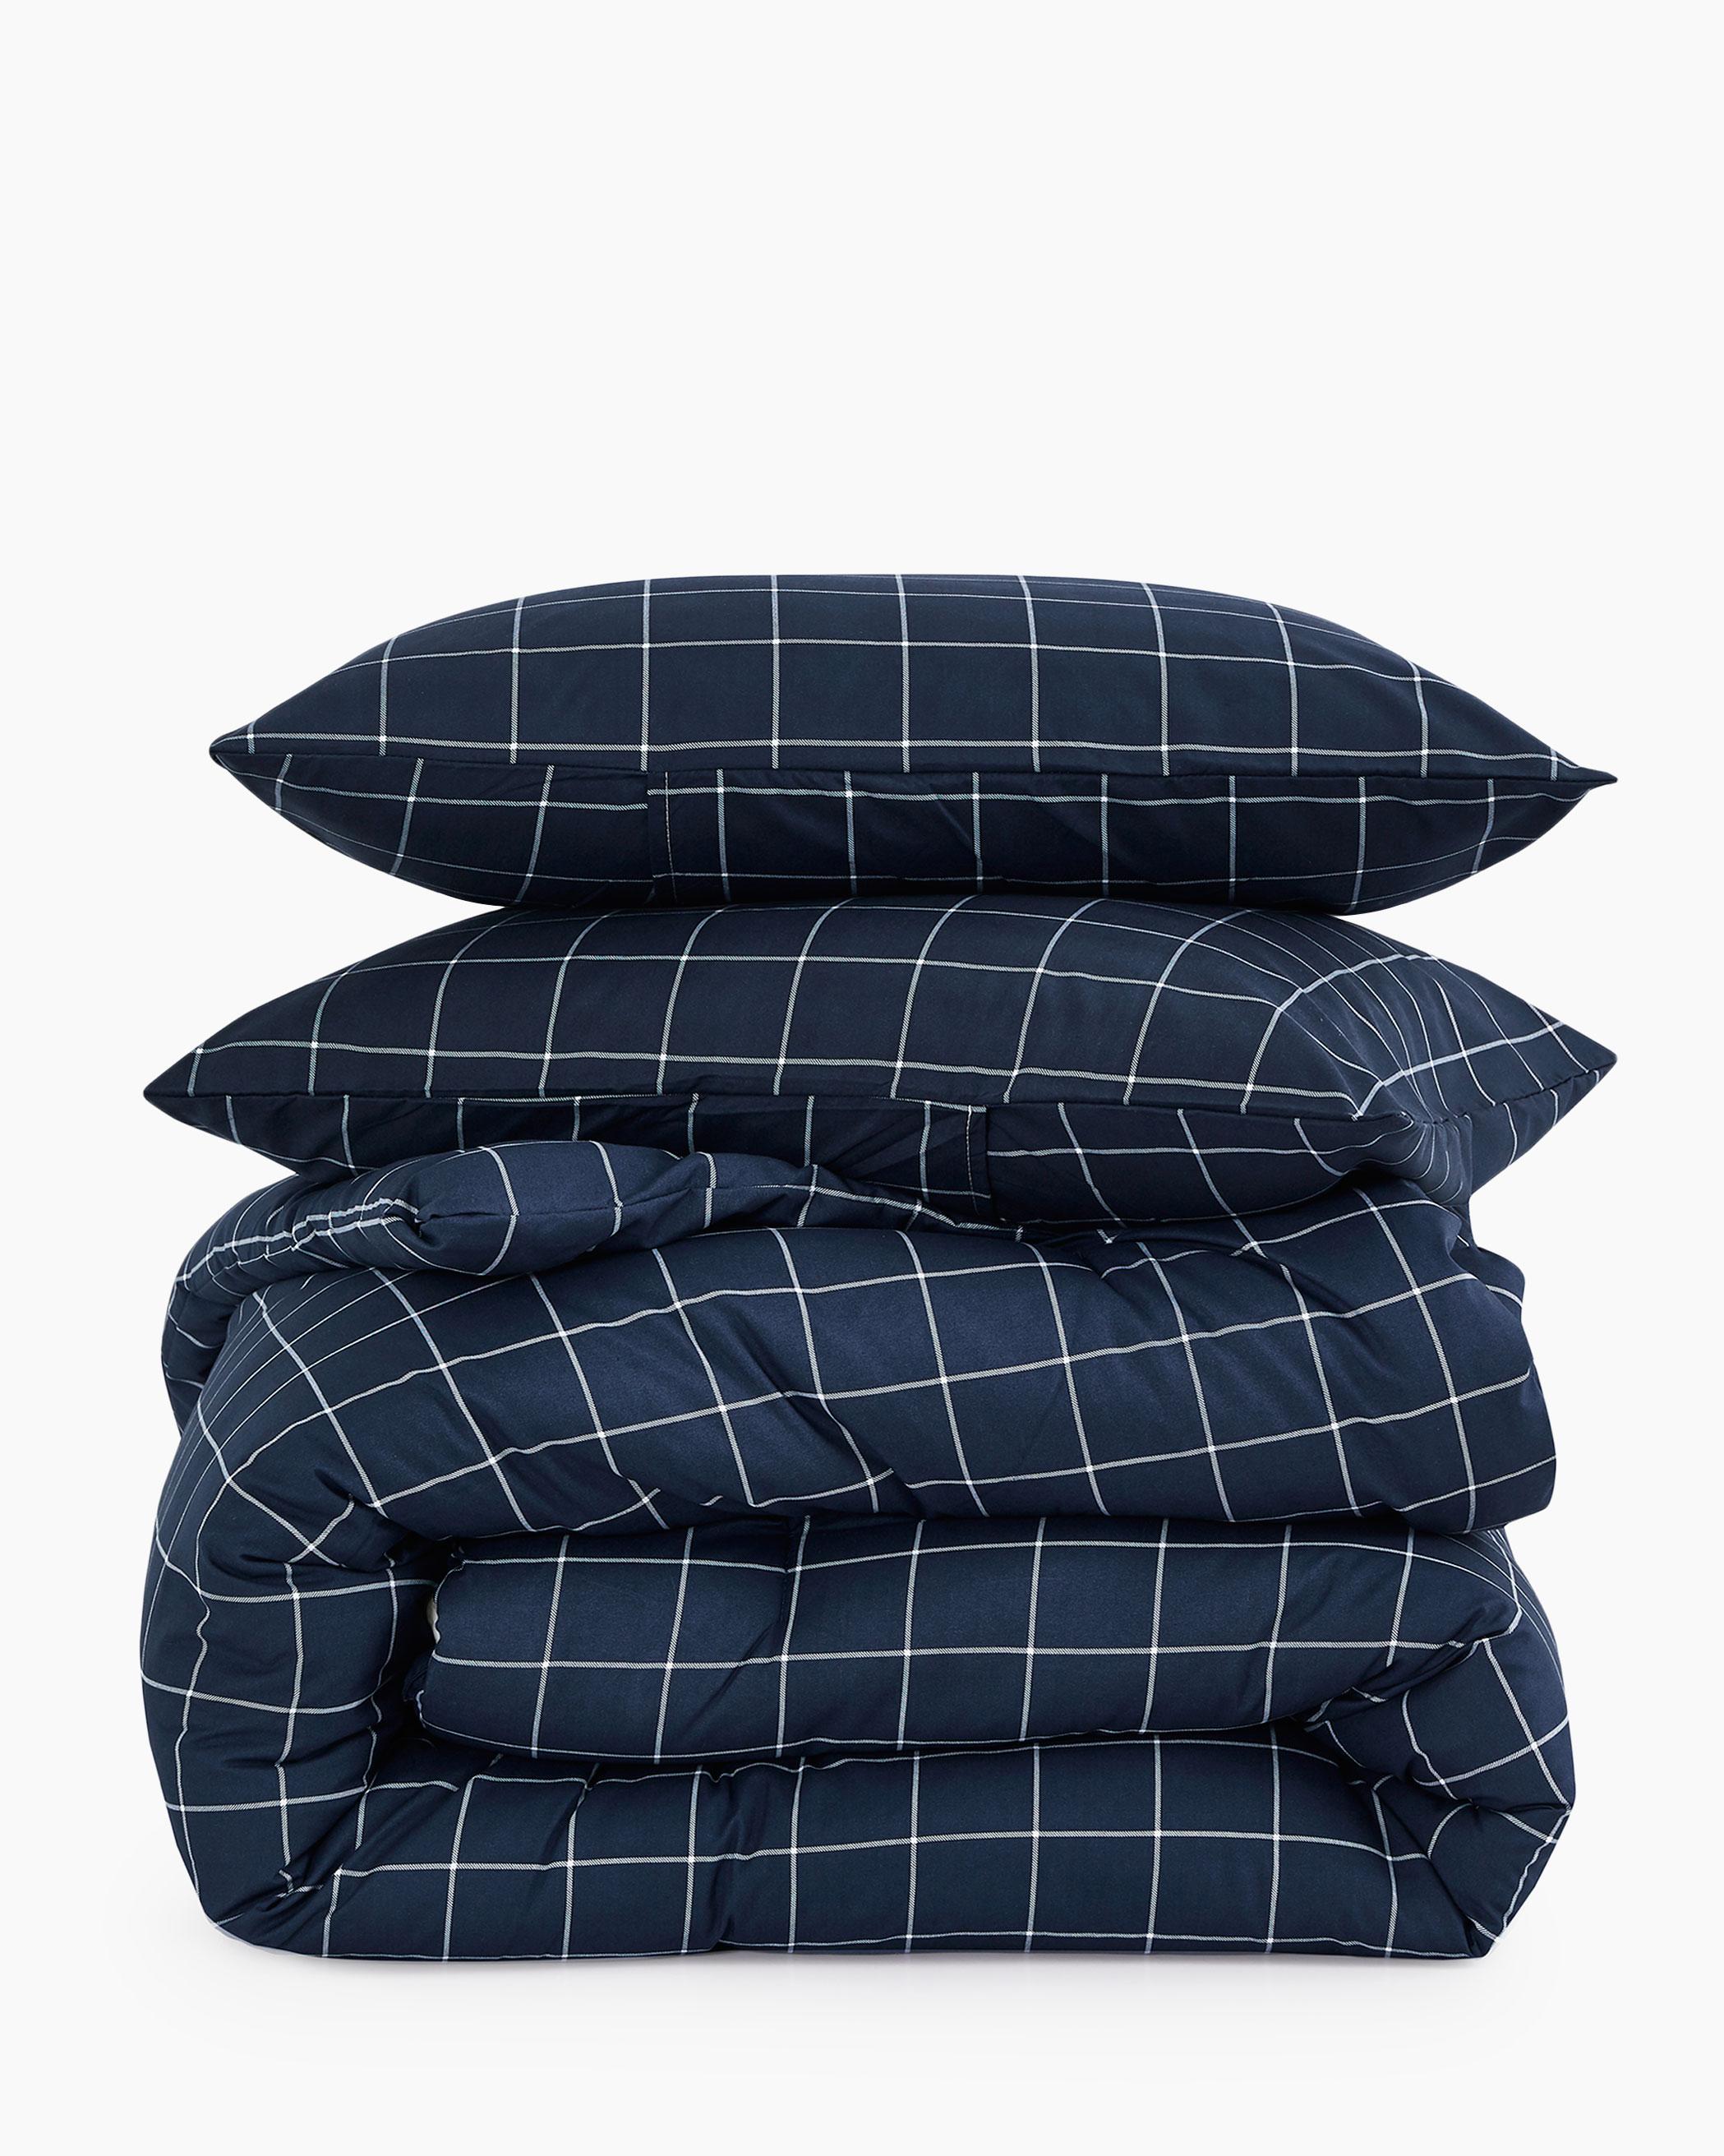 Navy Grid Microfiber Comforter Set